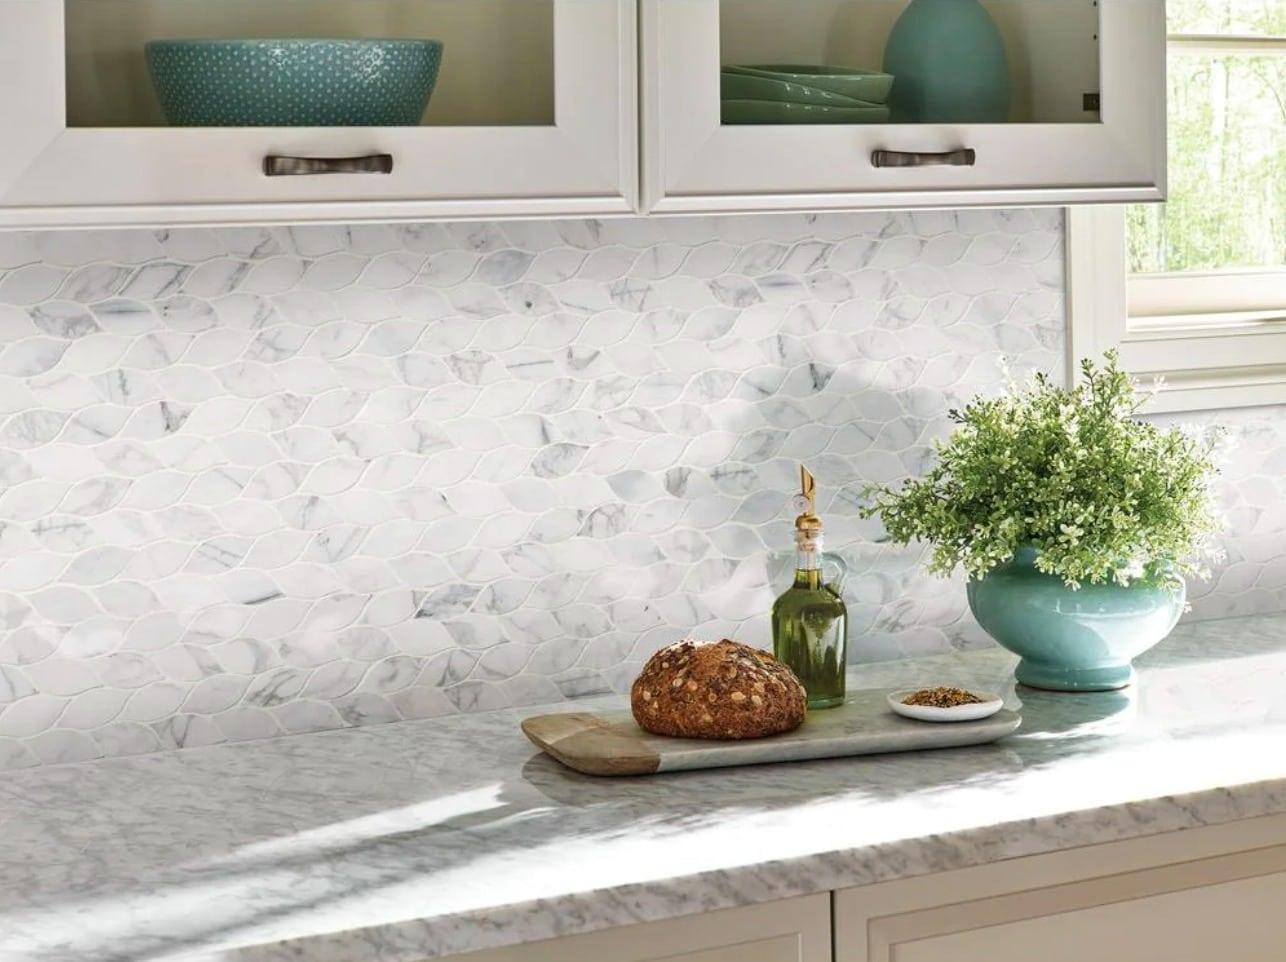 Choose Rustic Shapes with Modern Materials for a Natural Backsplash